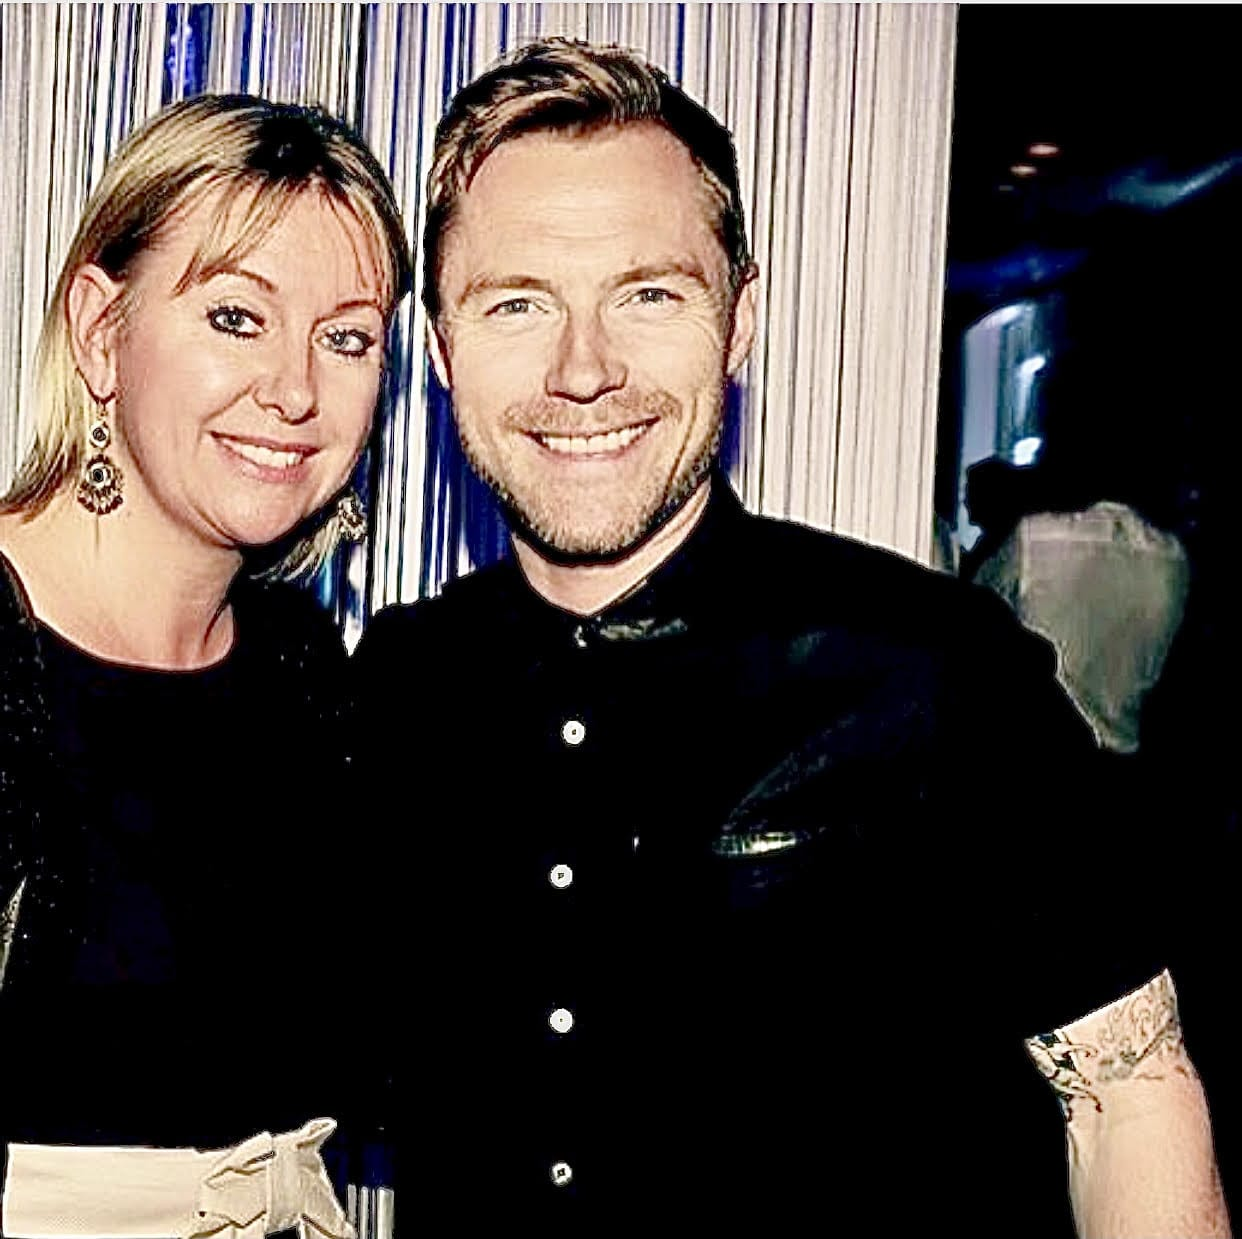 Noah's Ark Foundation International Public Relations Agency - Claire Barber - Head of International Public Relations UK